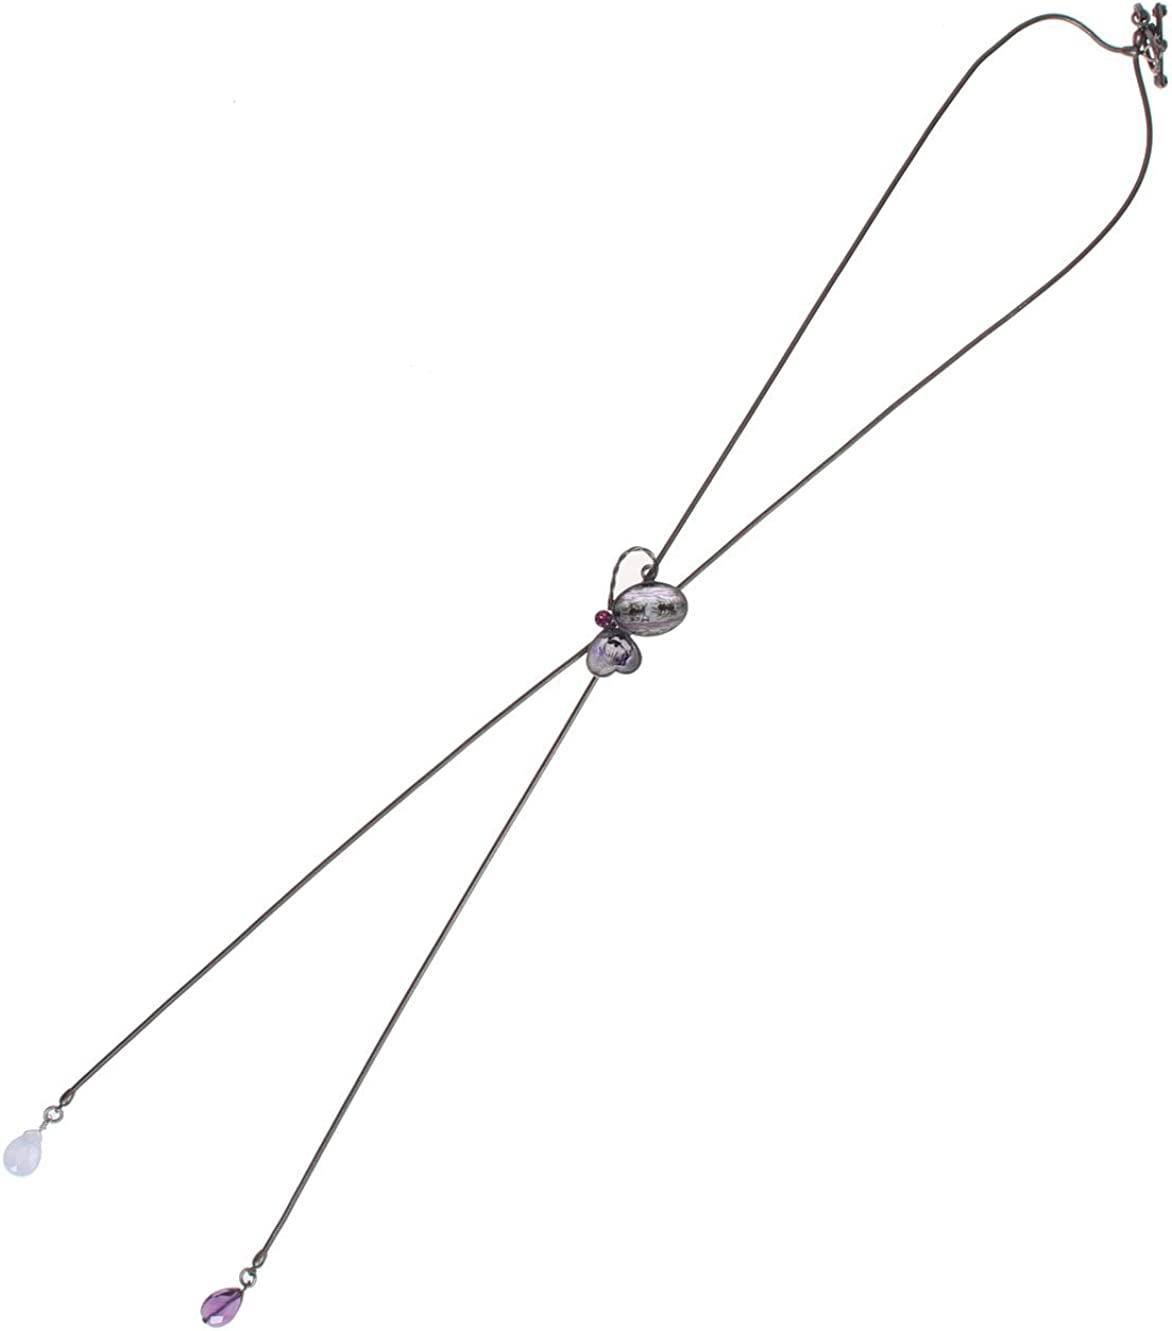 TAMARUSAN Bolo Tie Necklace Butterfly Purple Amethyst Blue Race Nickel Free Lily Tiger Beetle